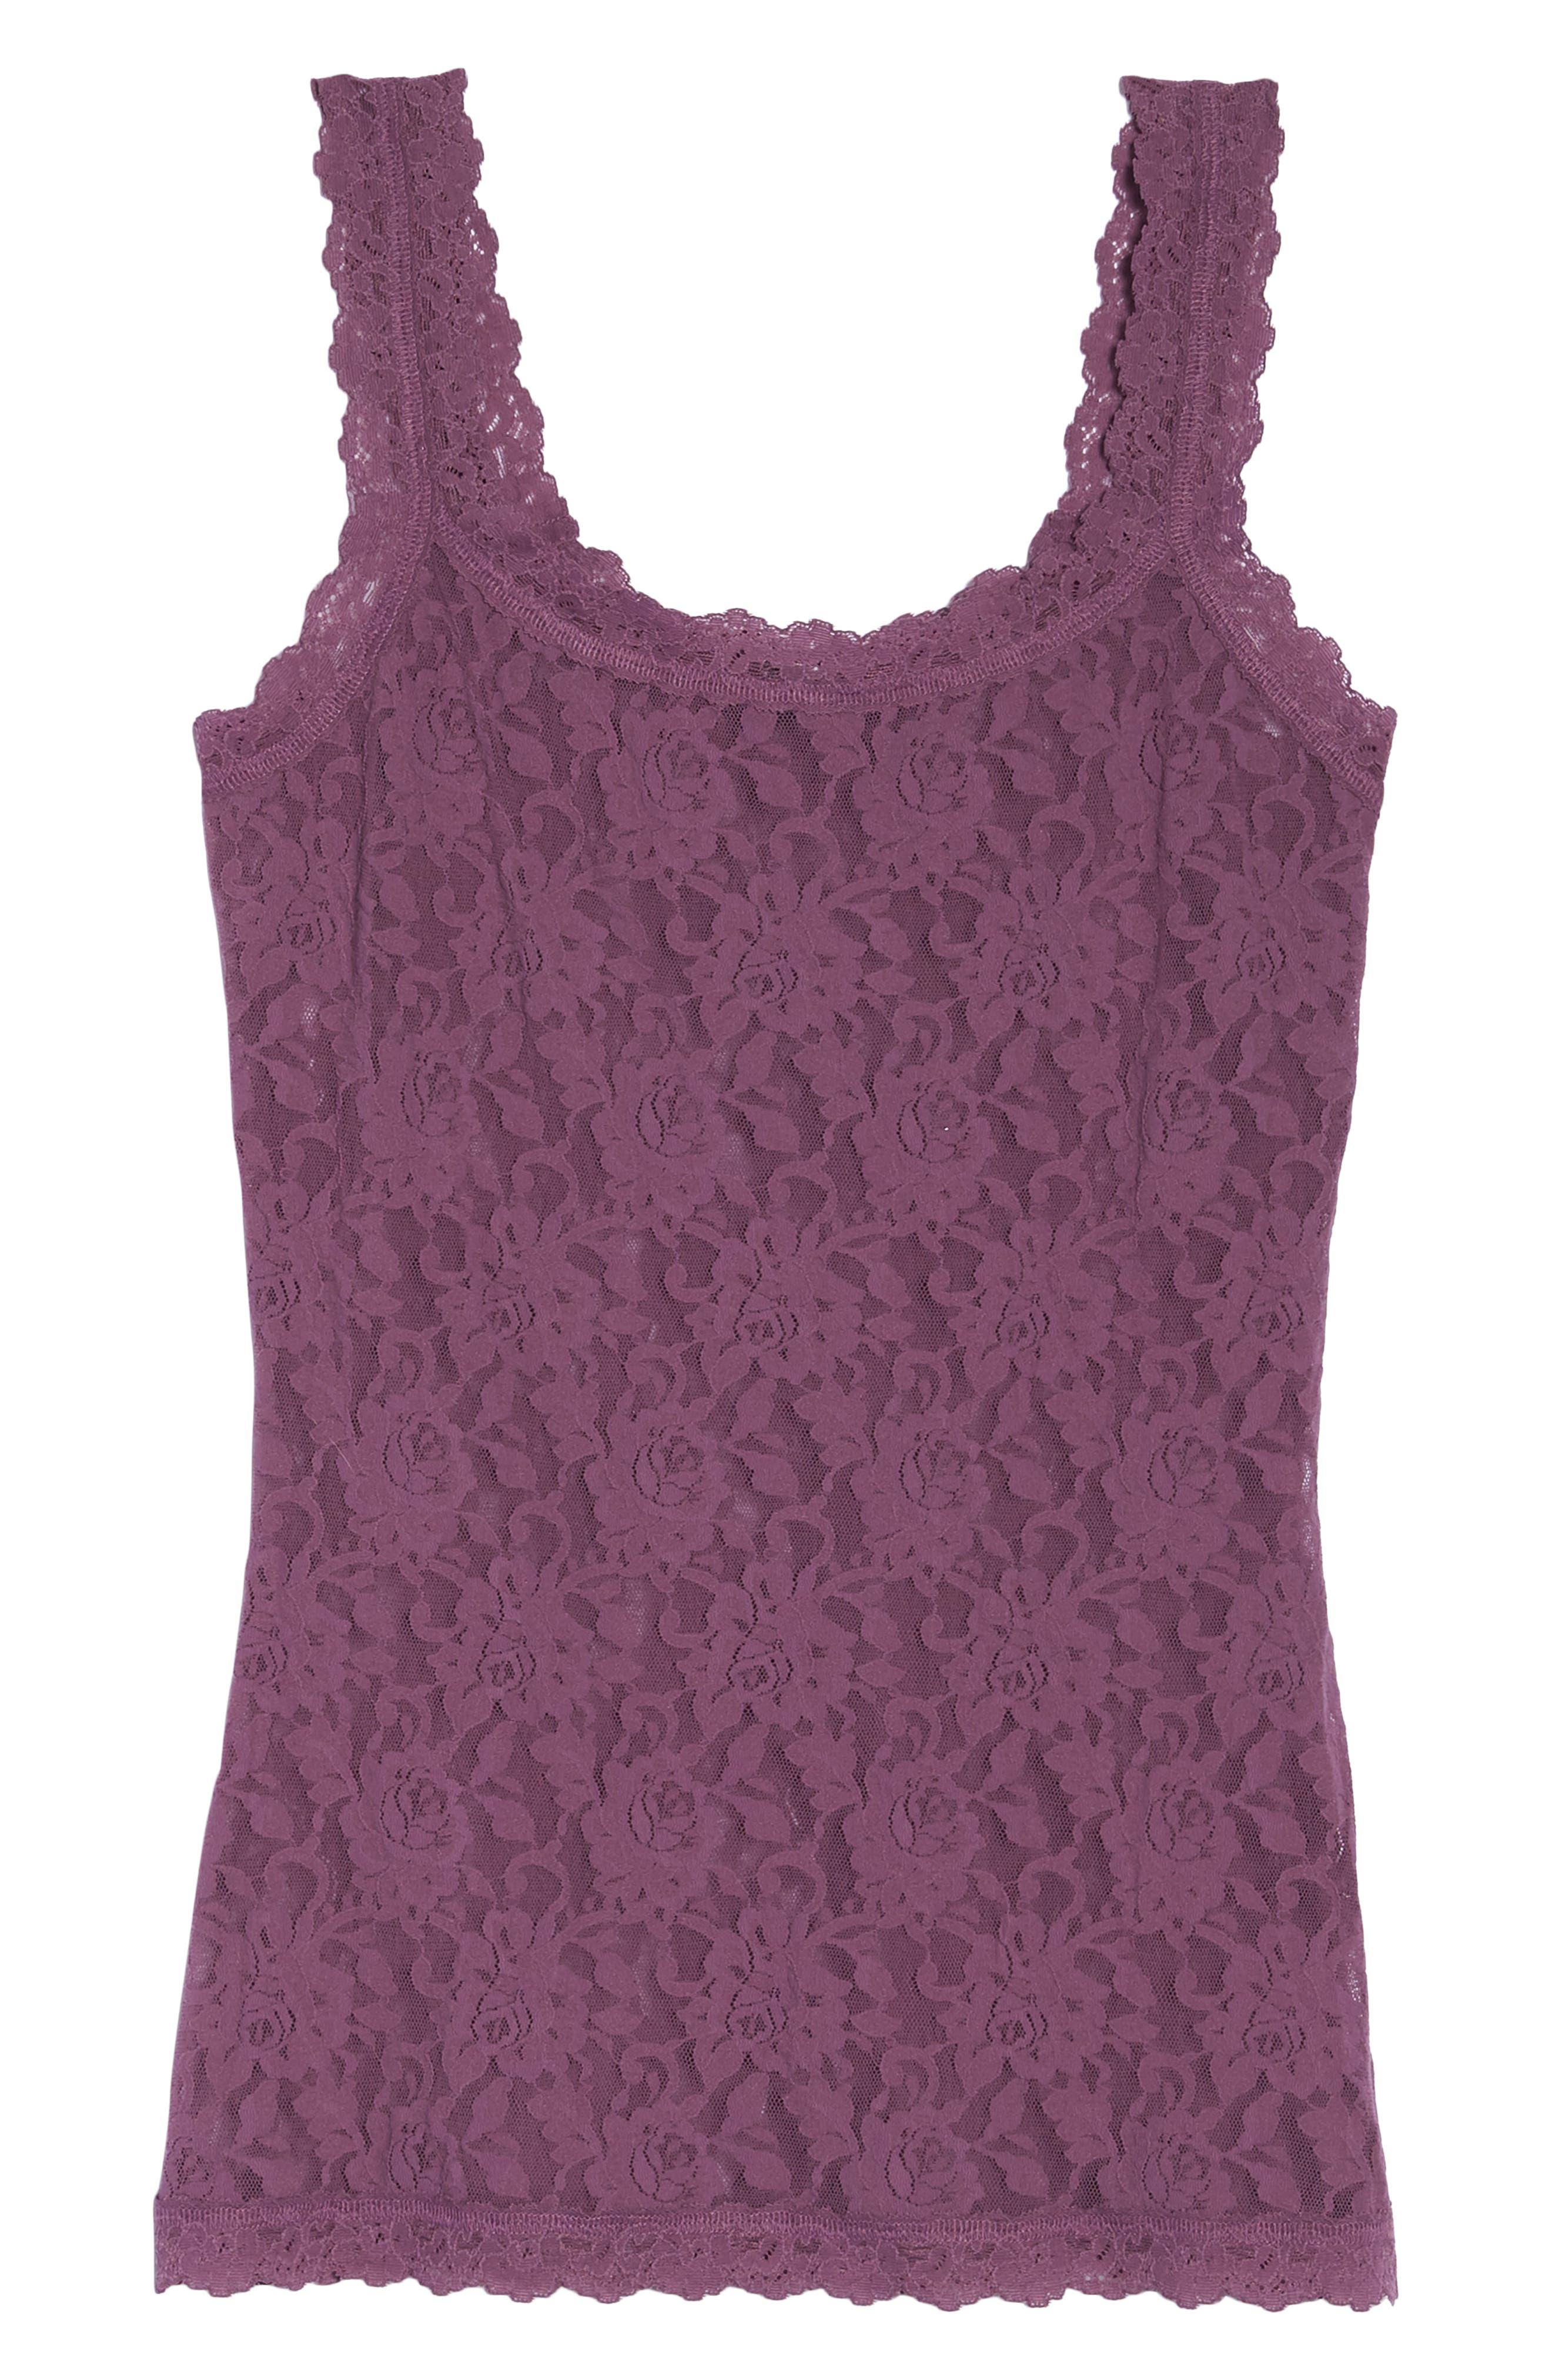 'Signature Lace' Camisole,                             Alternate thumbnail 7, color,                             Valiant Purple